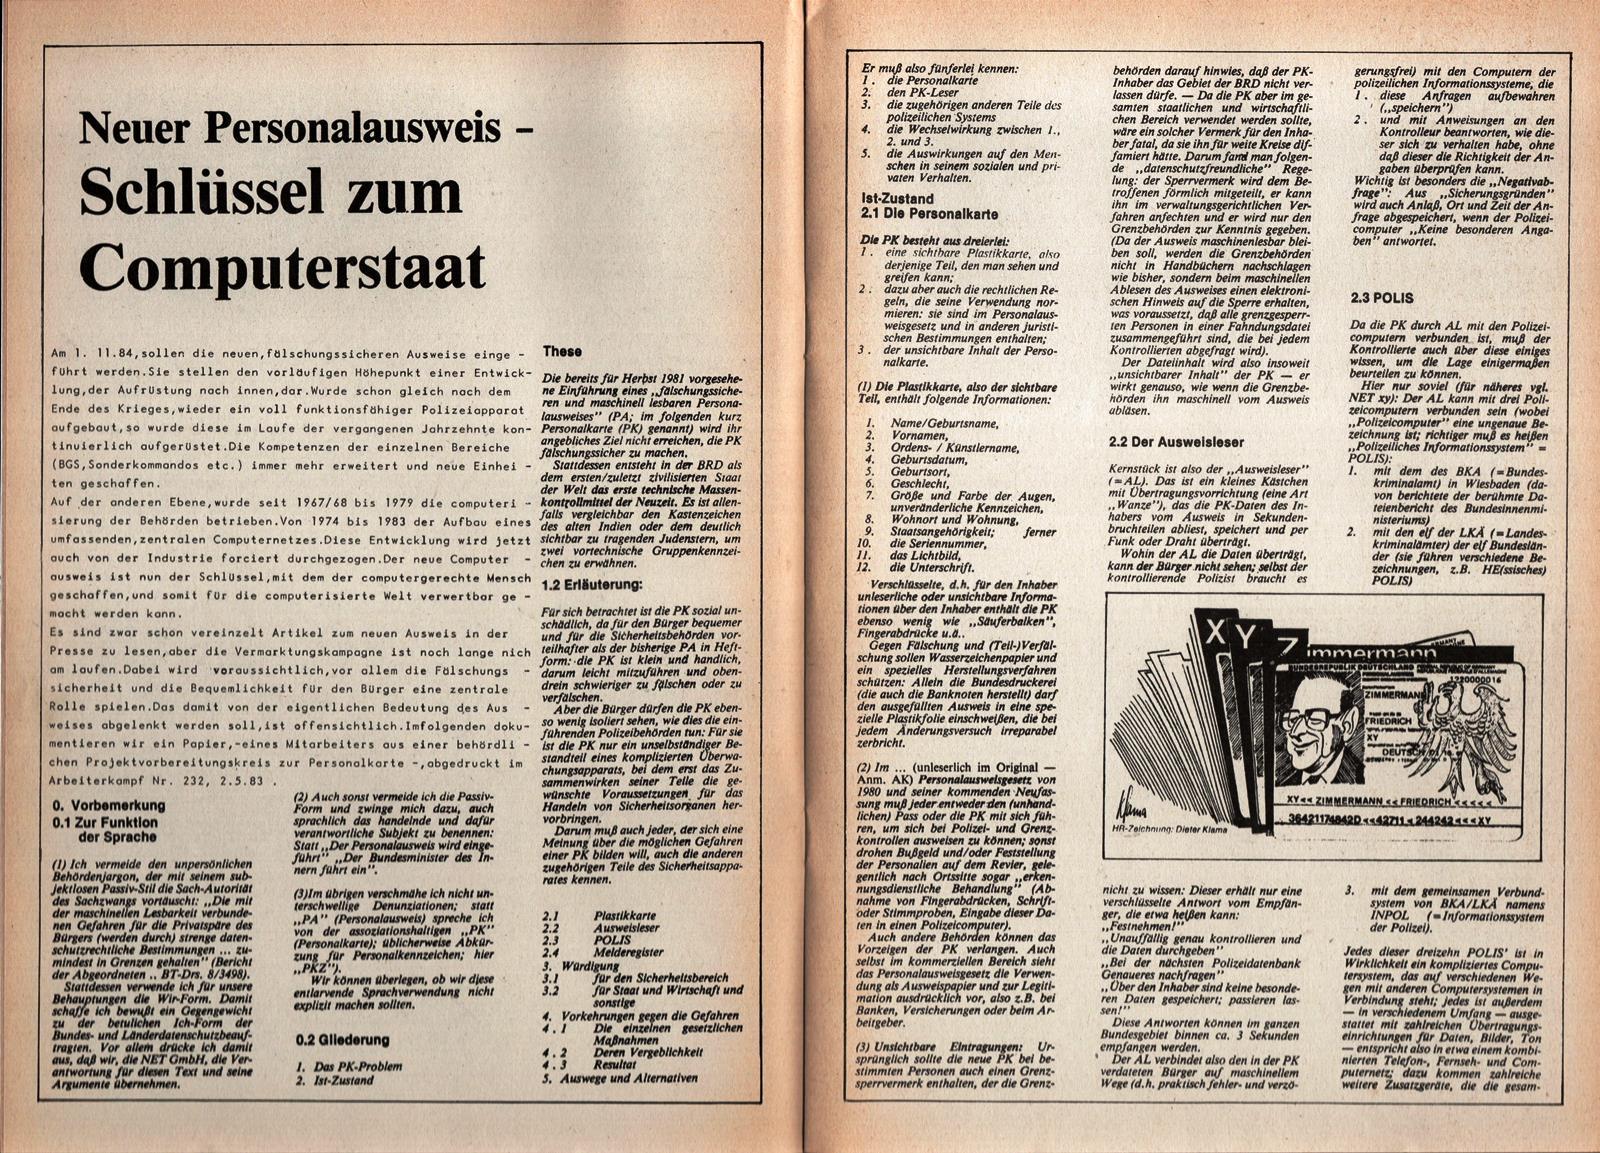 Frankfurt_Aktion_19830600_003_006